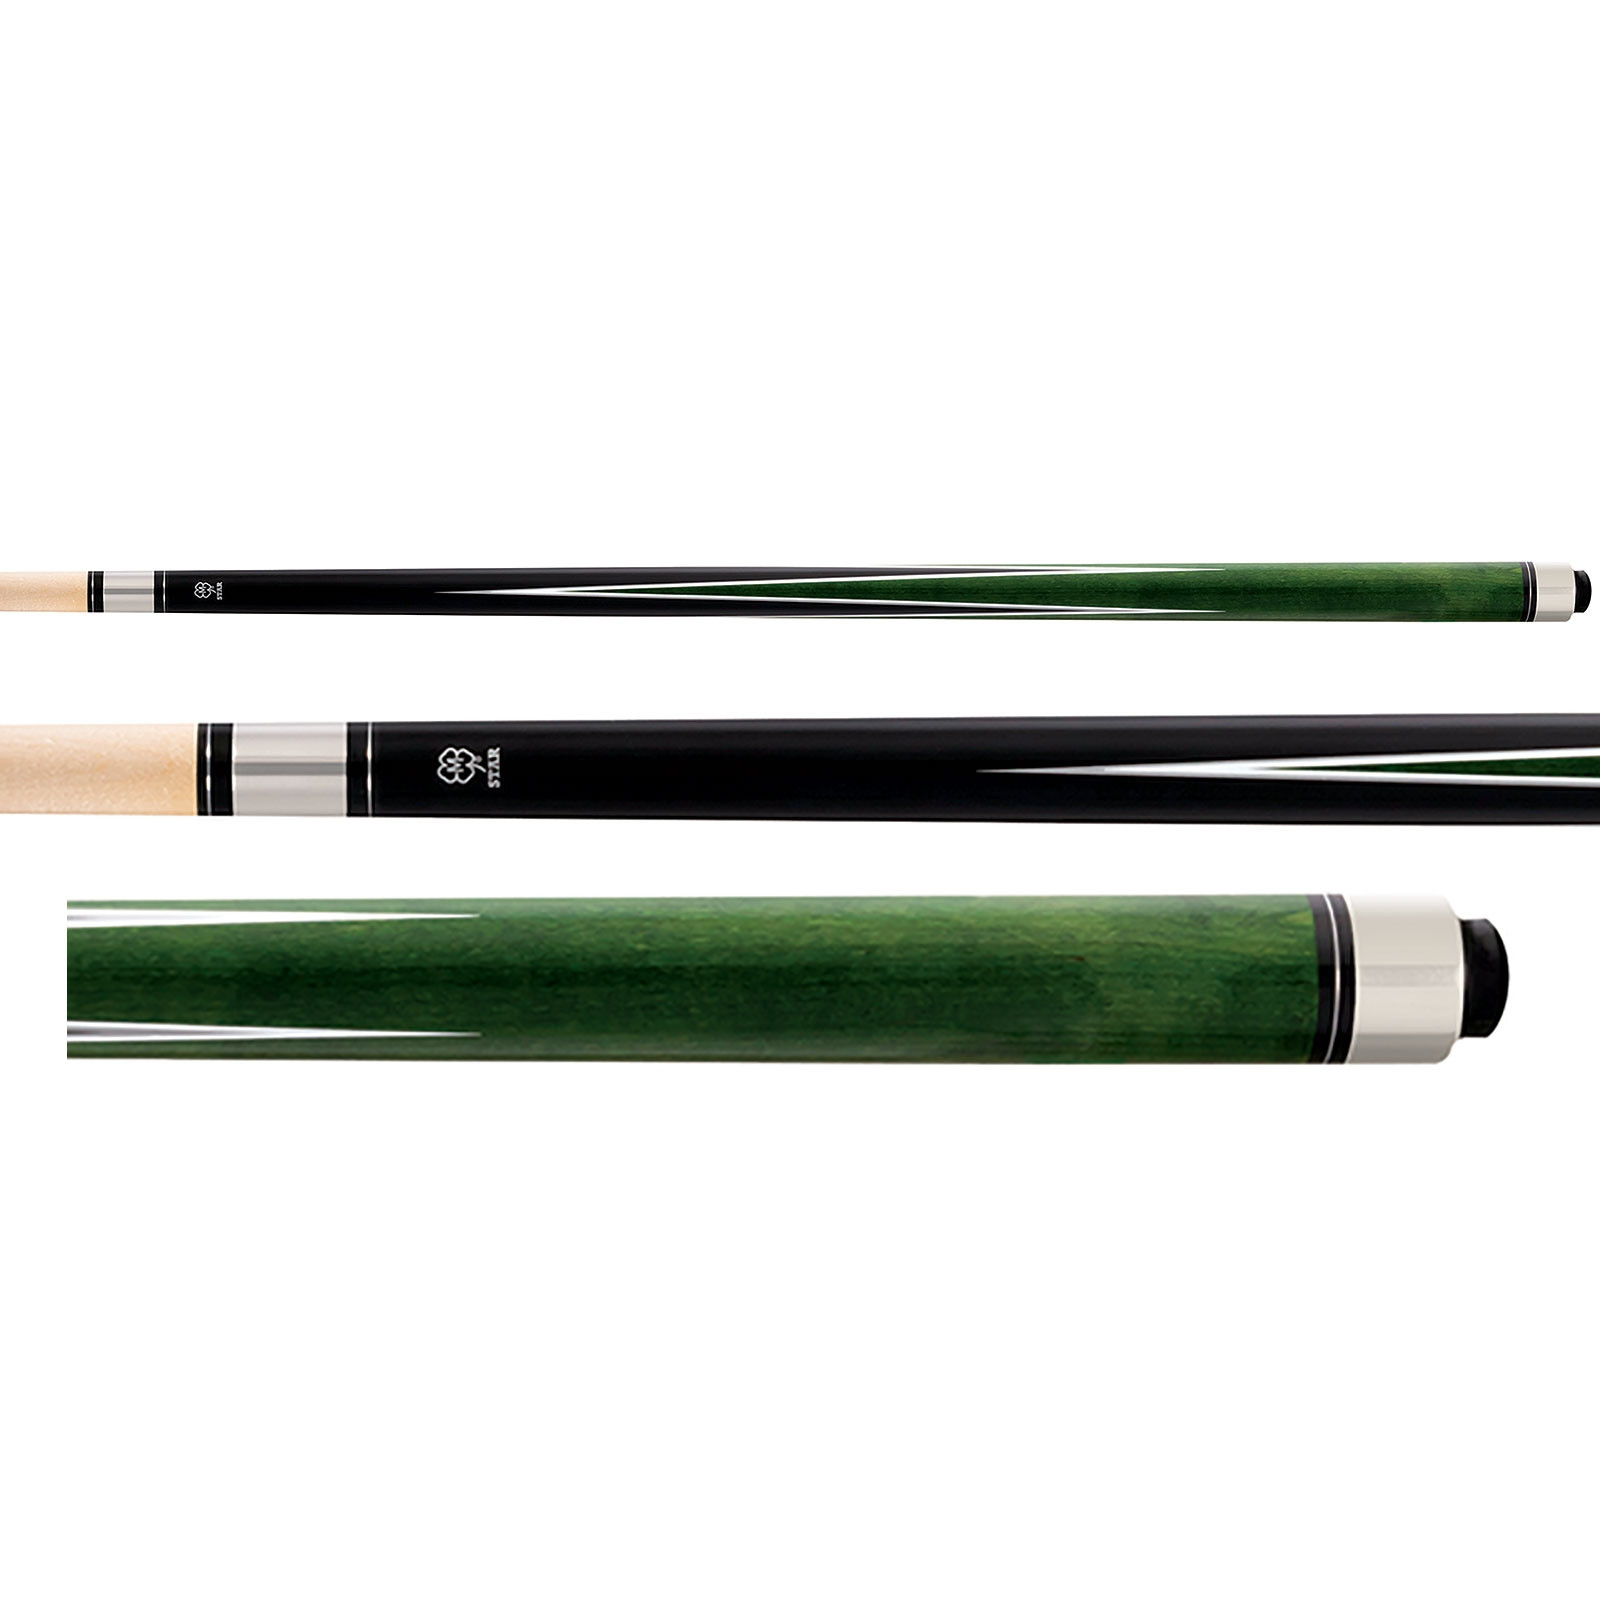 McDermott Star S71 Pool Cue - Black/Green